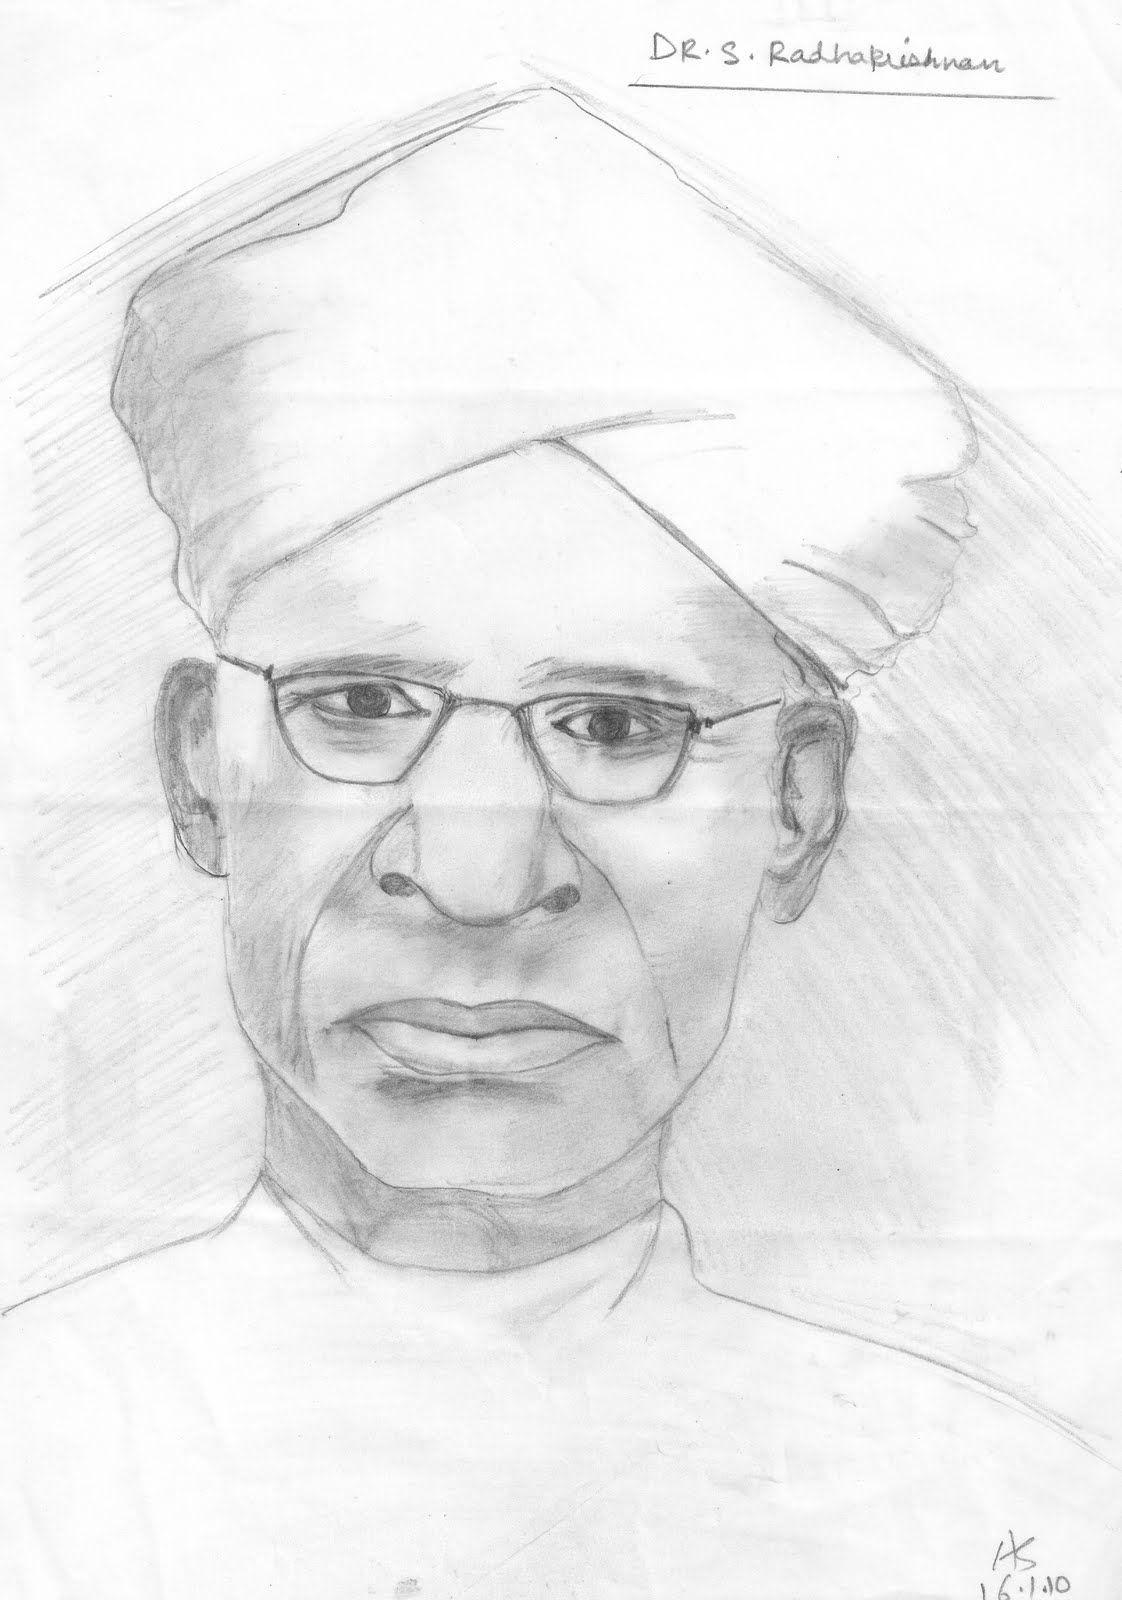 Dr sarvepalli radhakrishnan was an indian philosopher and